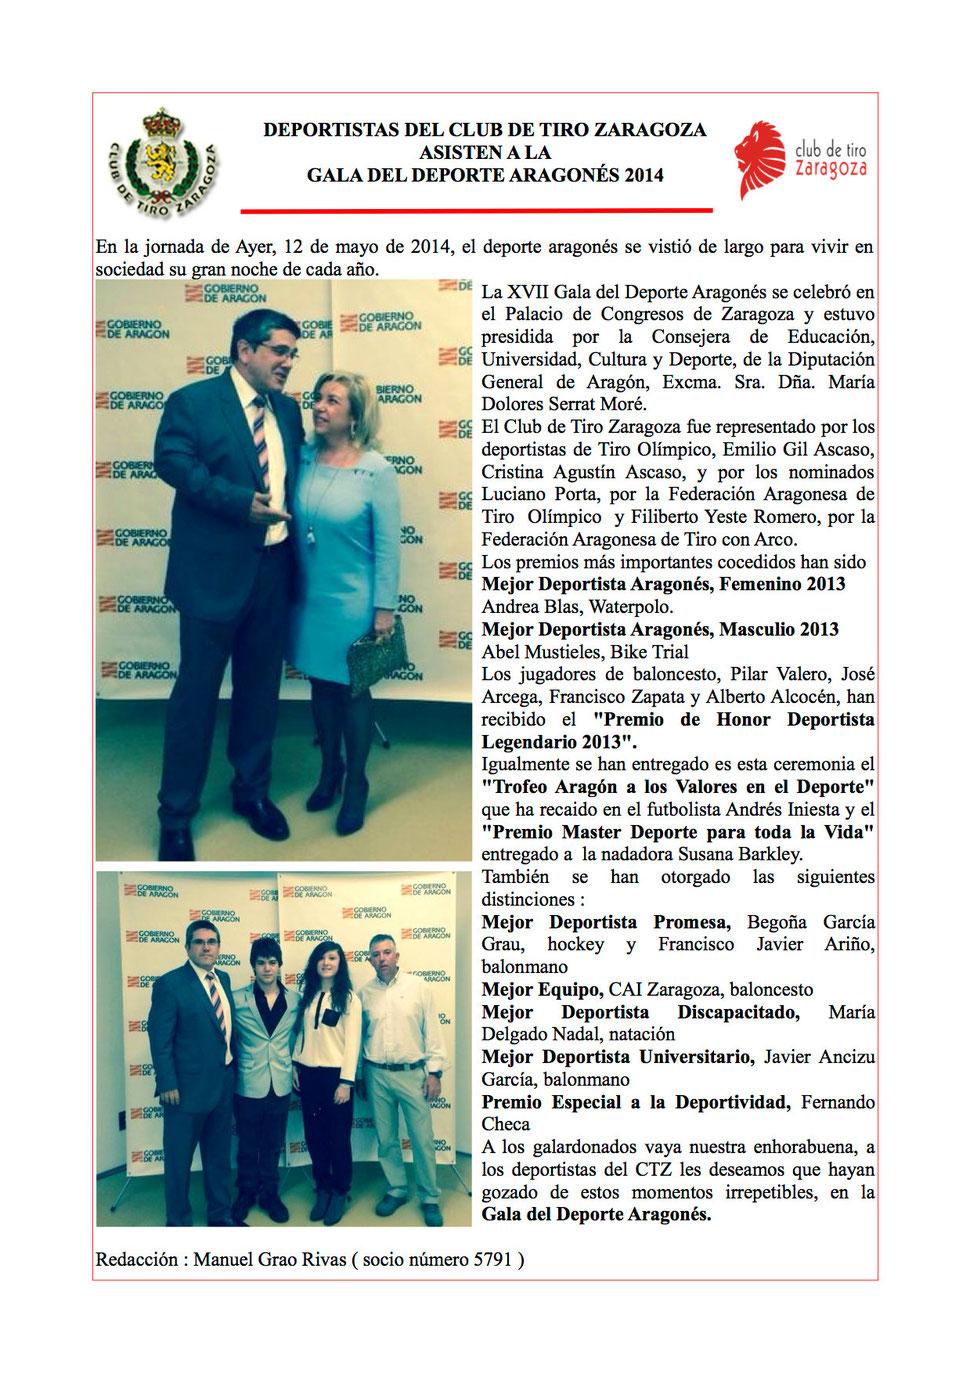 GALA DEPORTE ARAGONES 2014